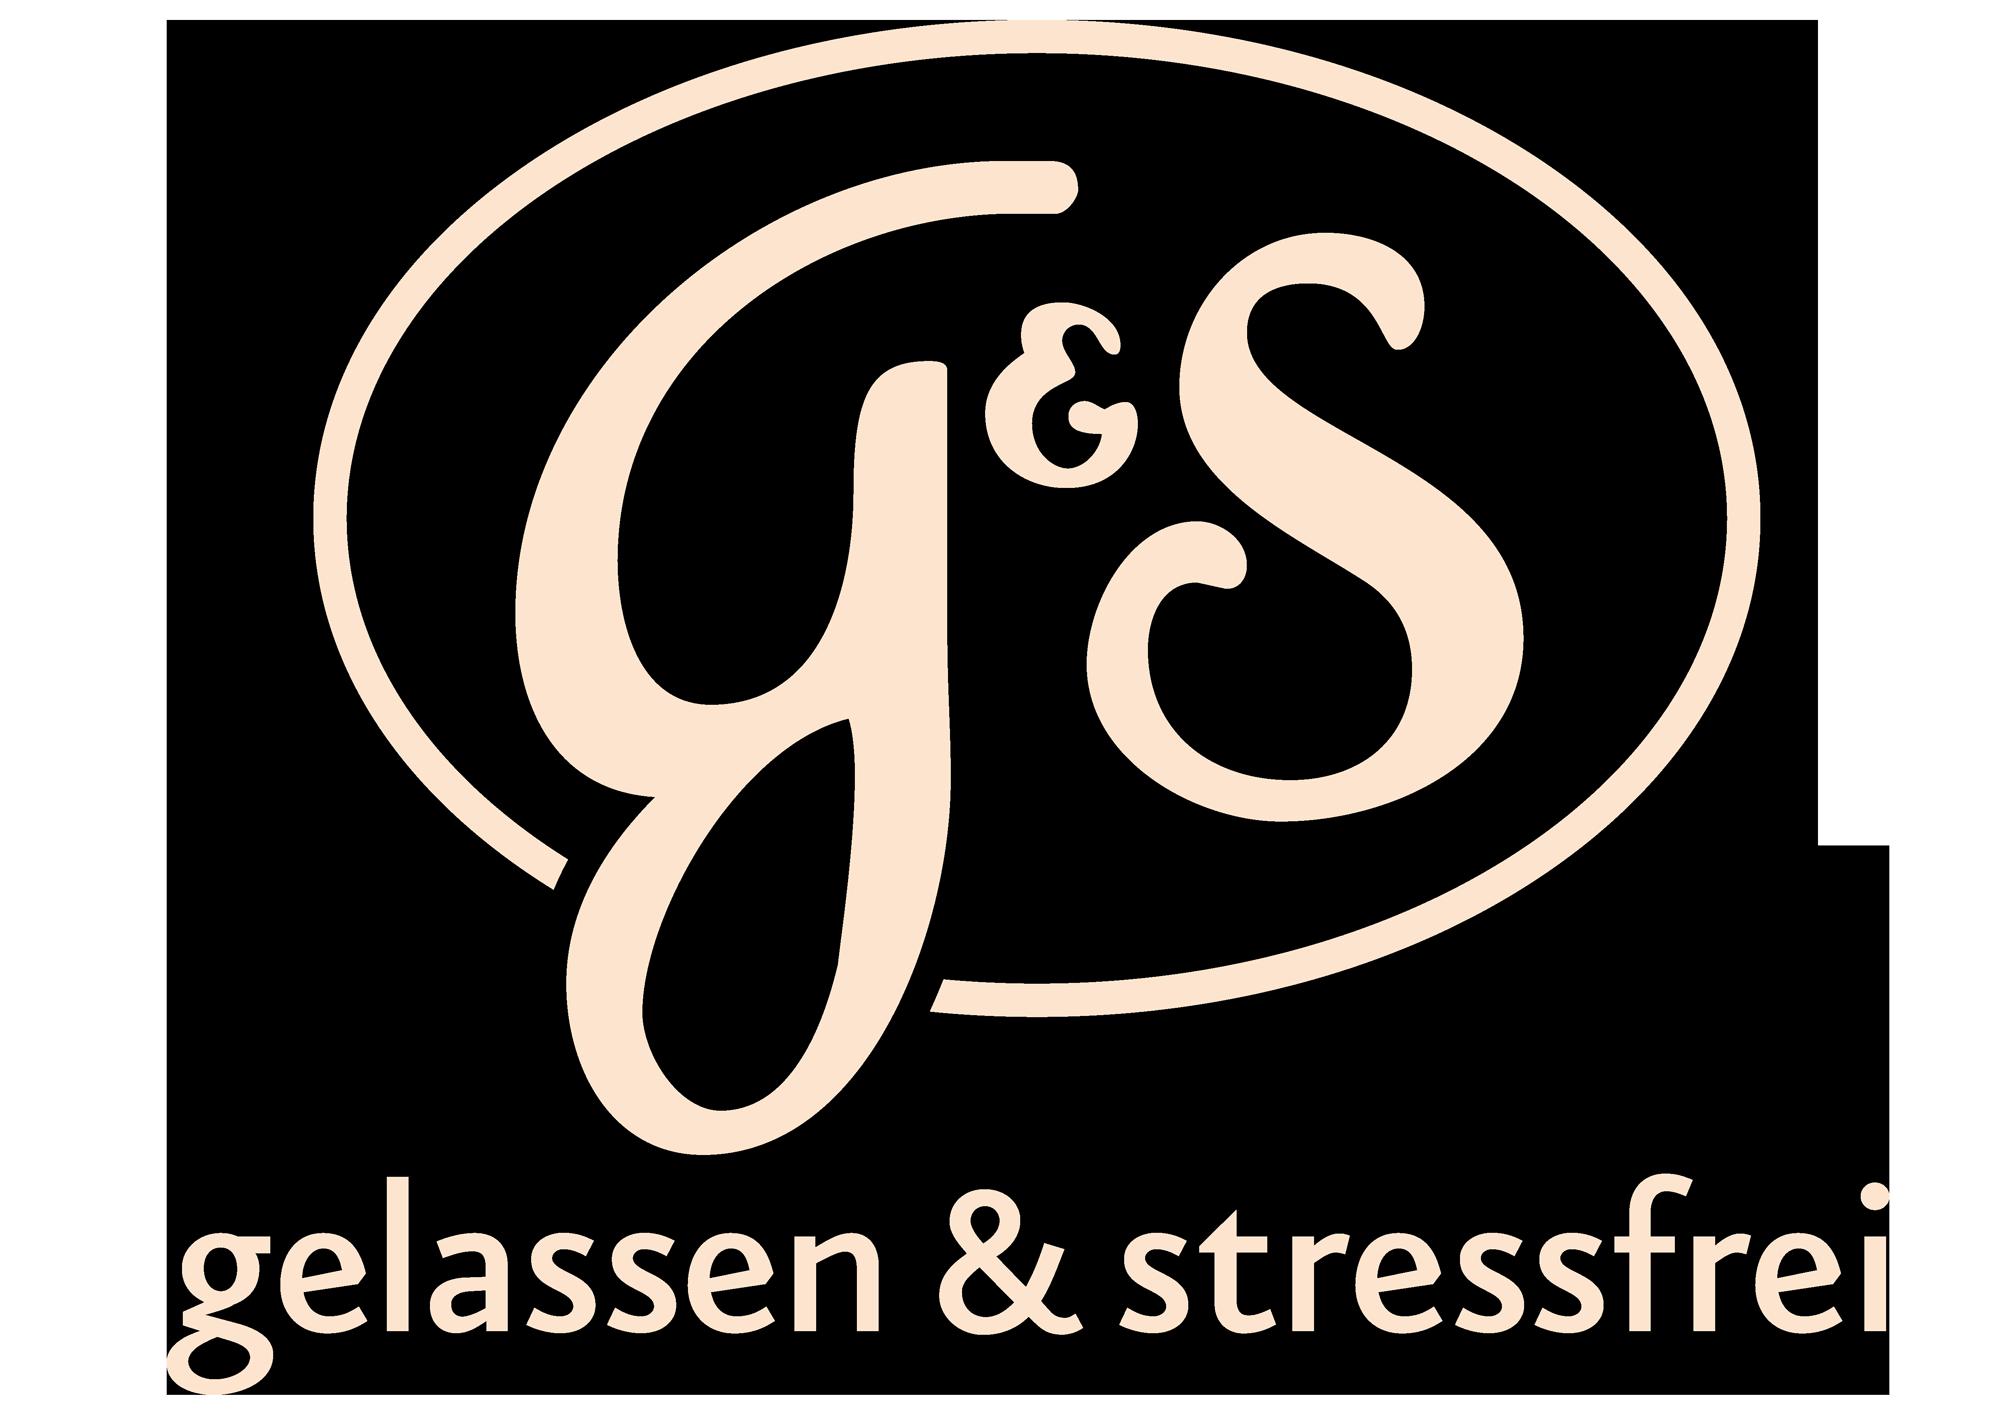 gelassenundstressfrei.de